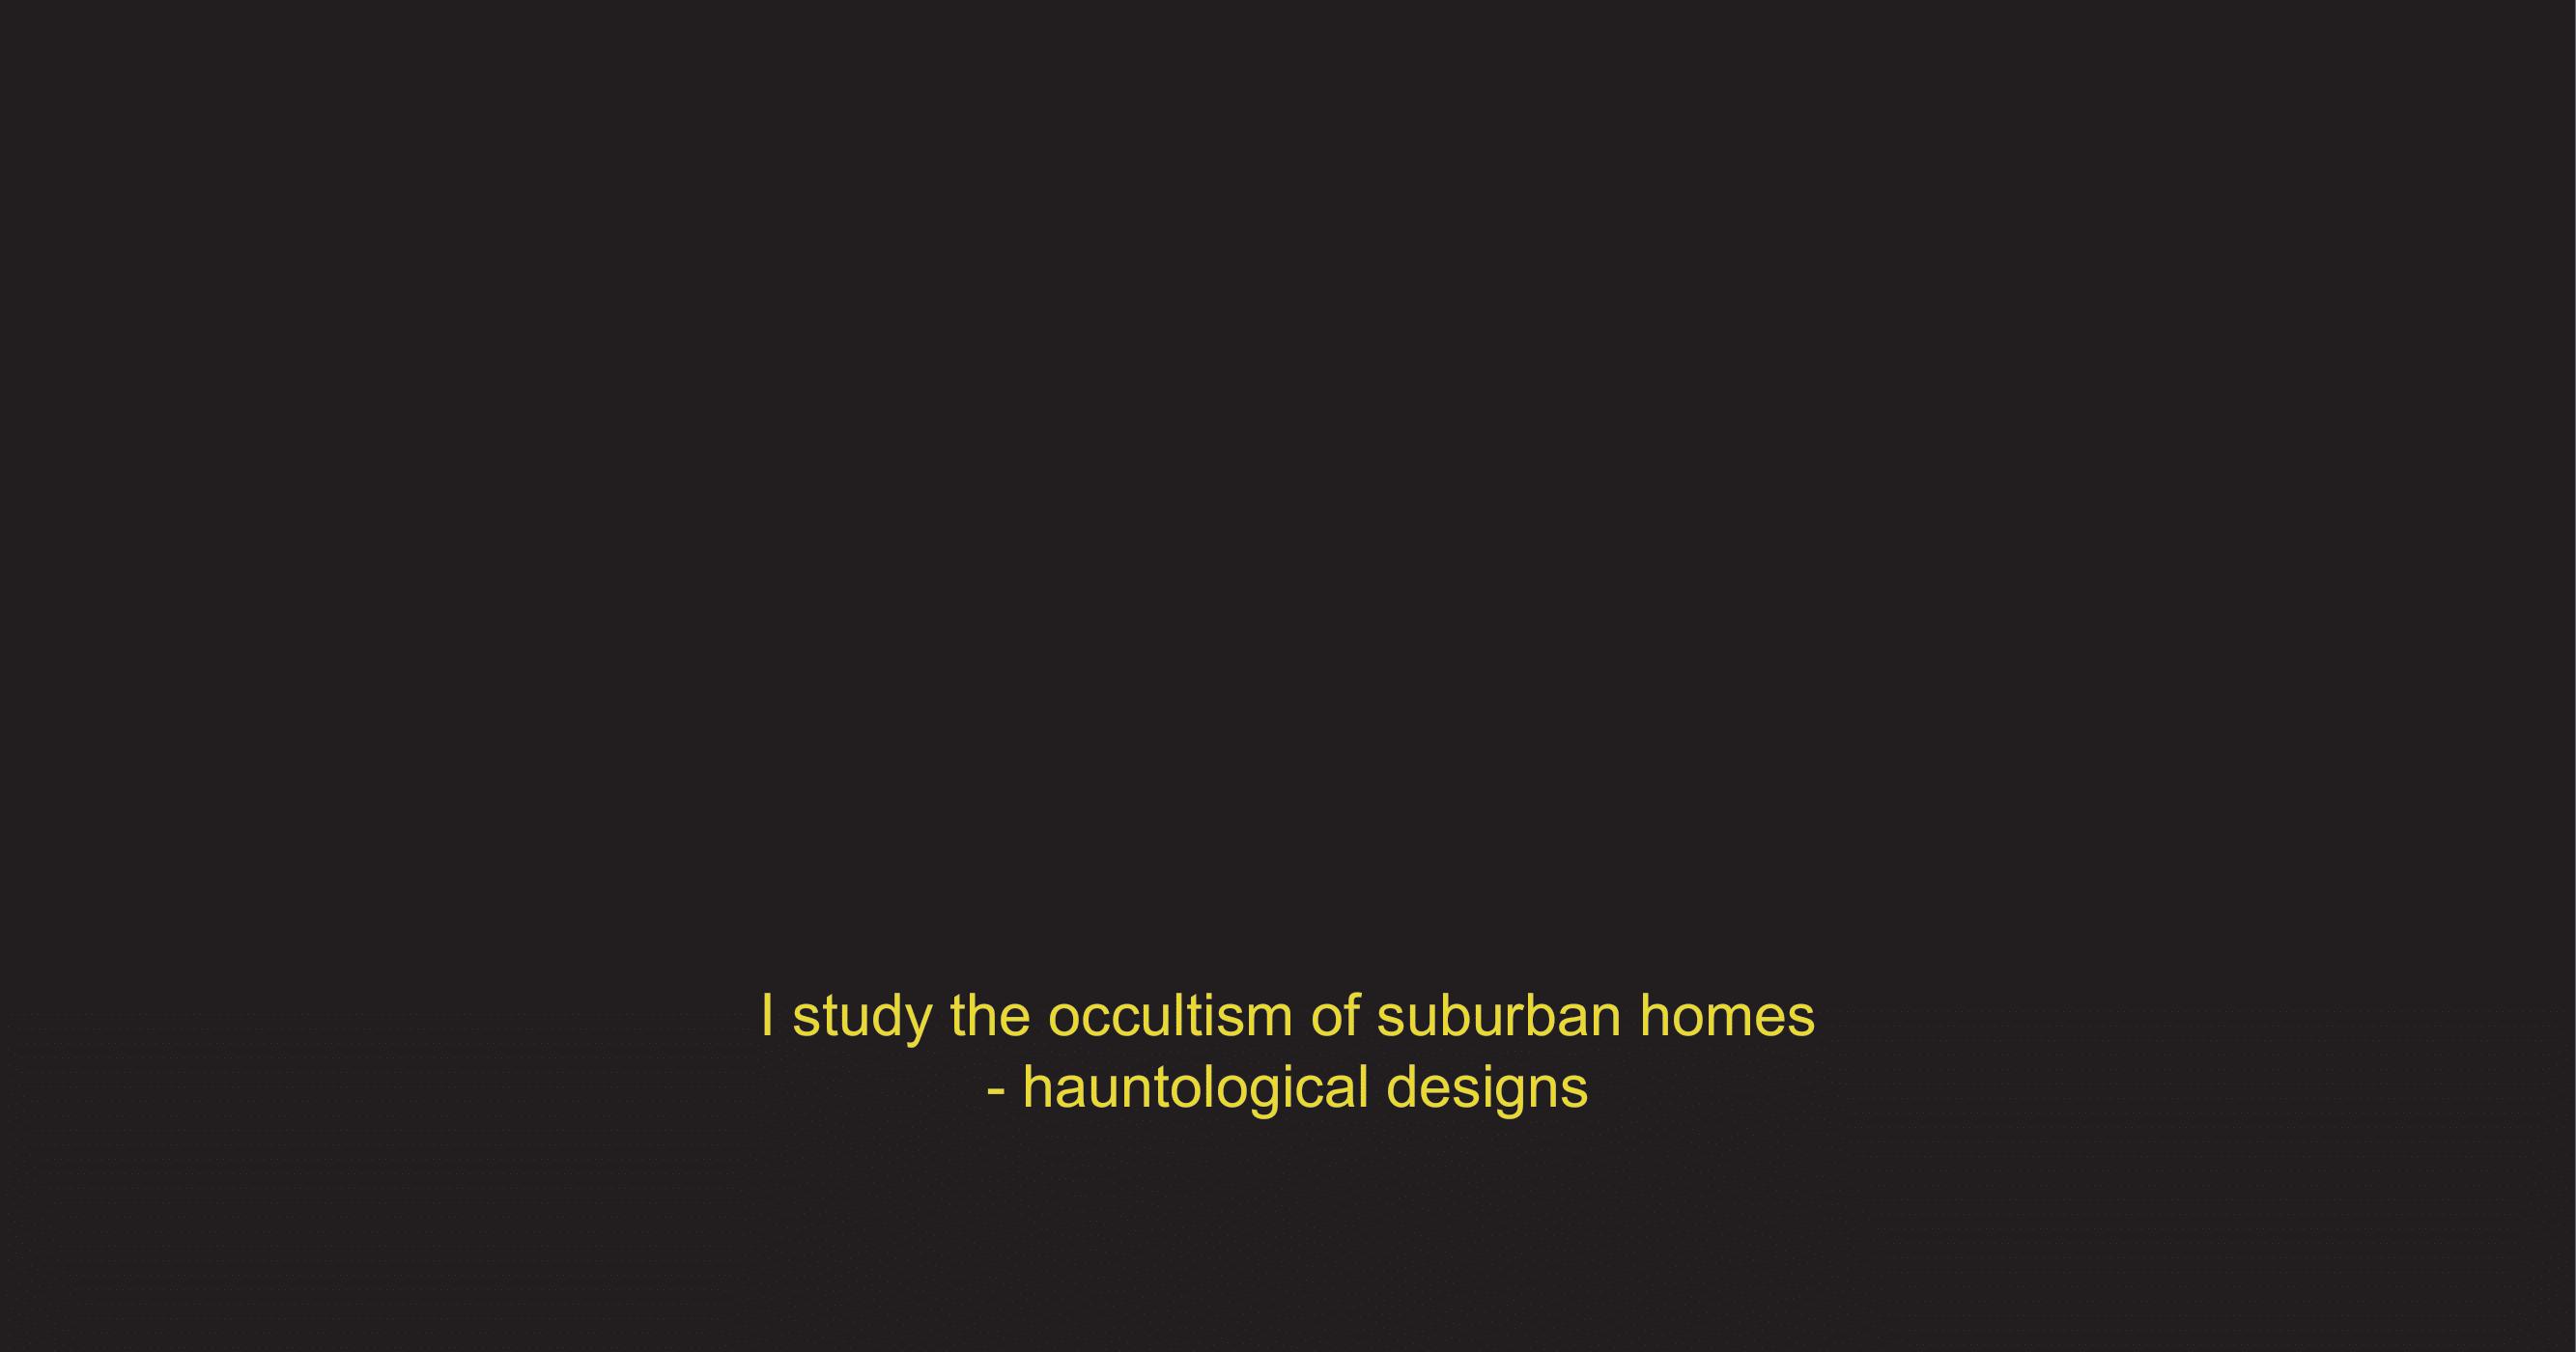 subtitle_project_1-01